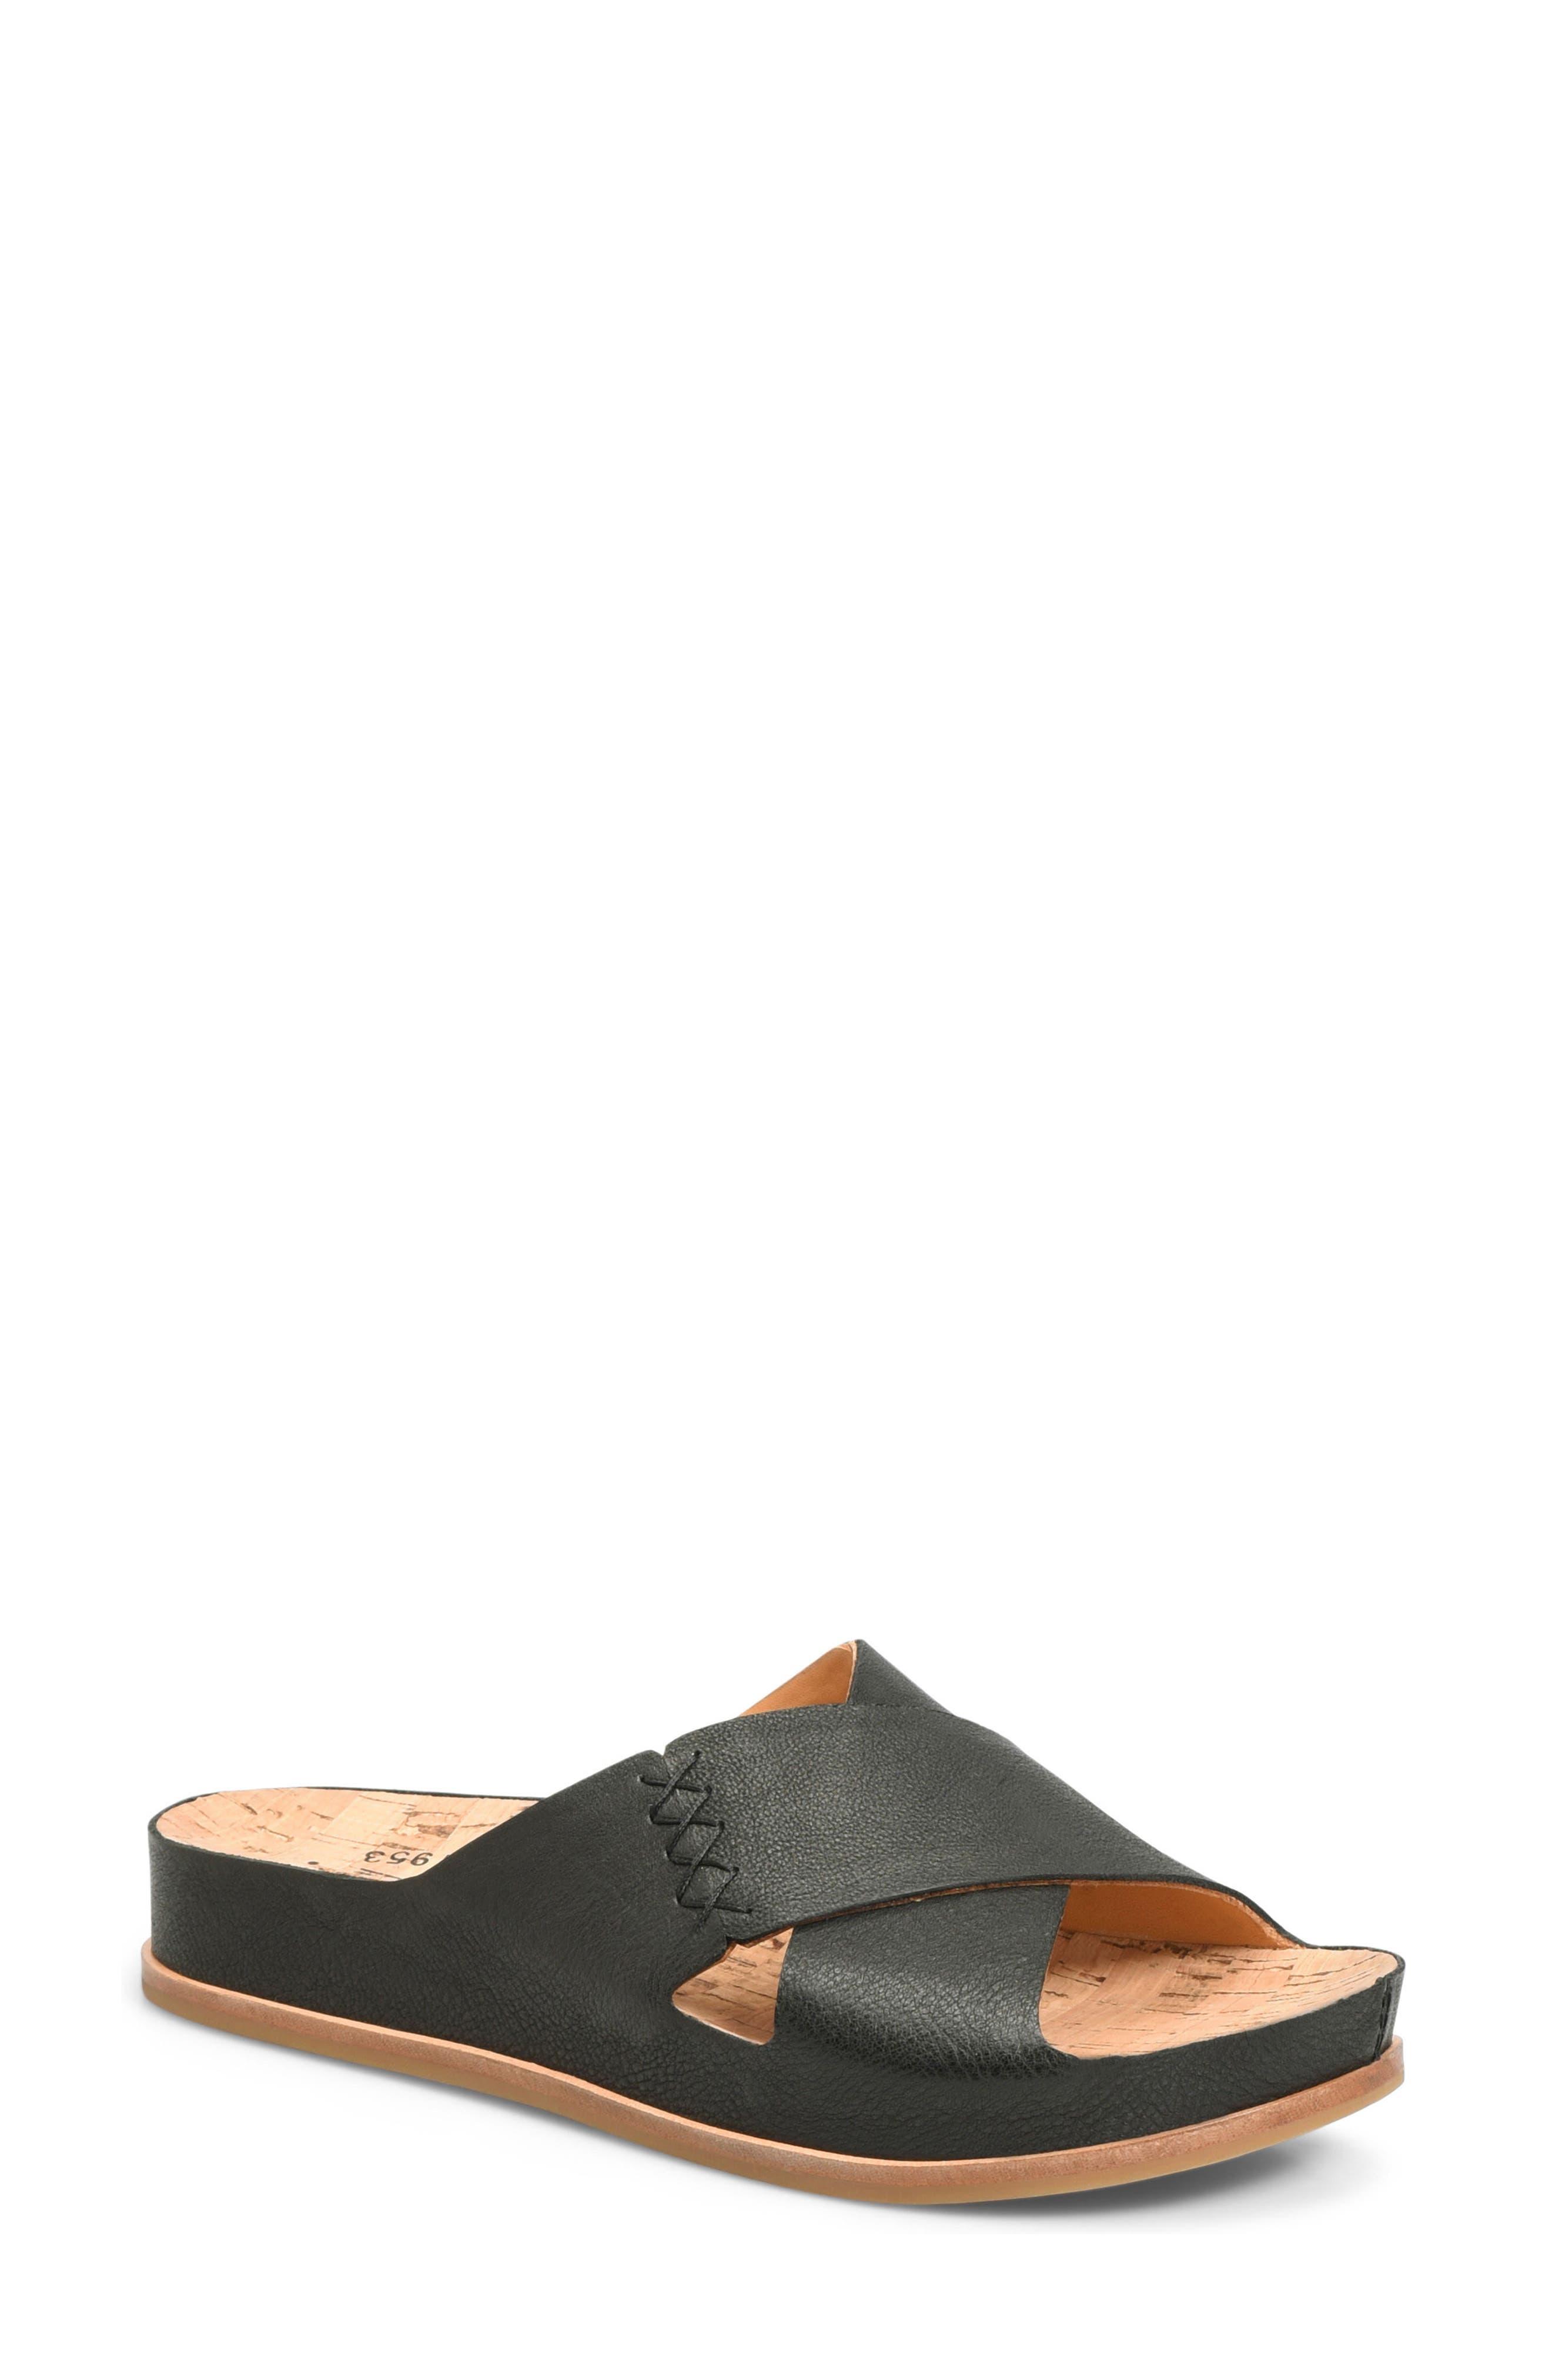 Amboy Slide Sandal,                         Main,                         color, 001